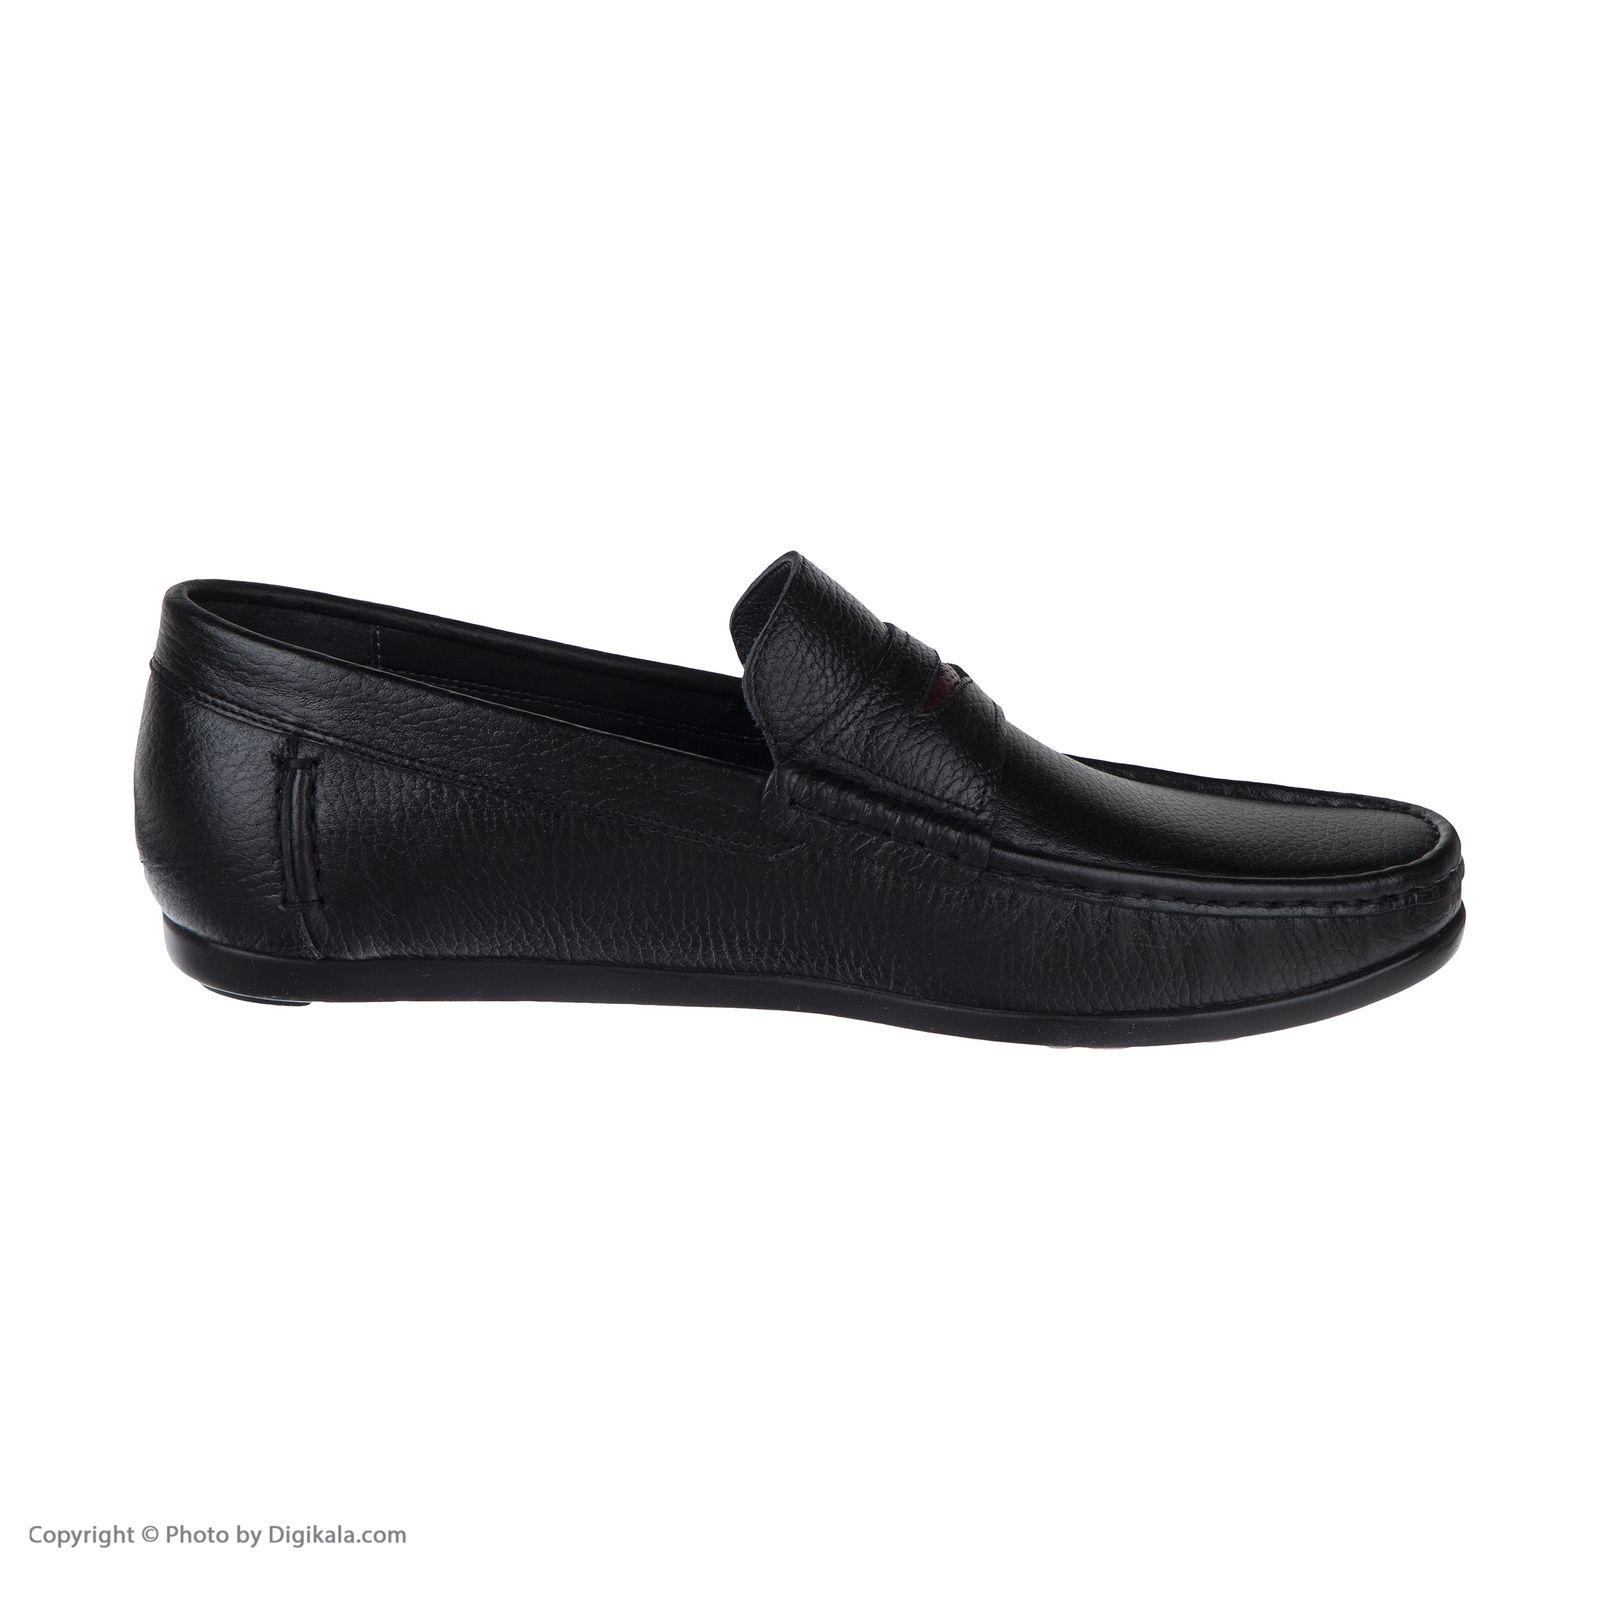 کفش روزمره مردانه ساتین مدل 7611A503101 -  - 6